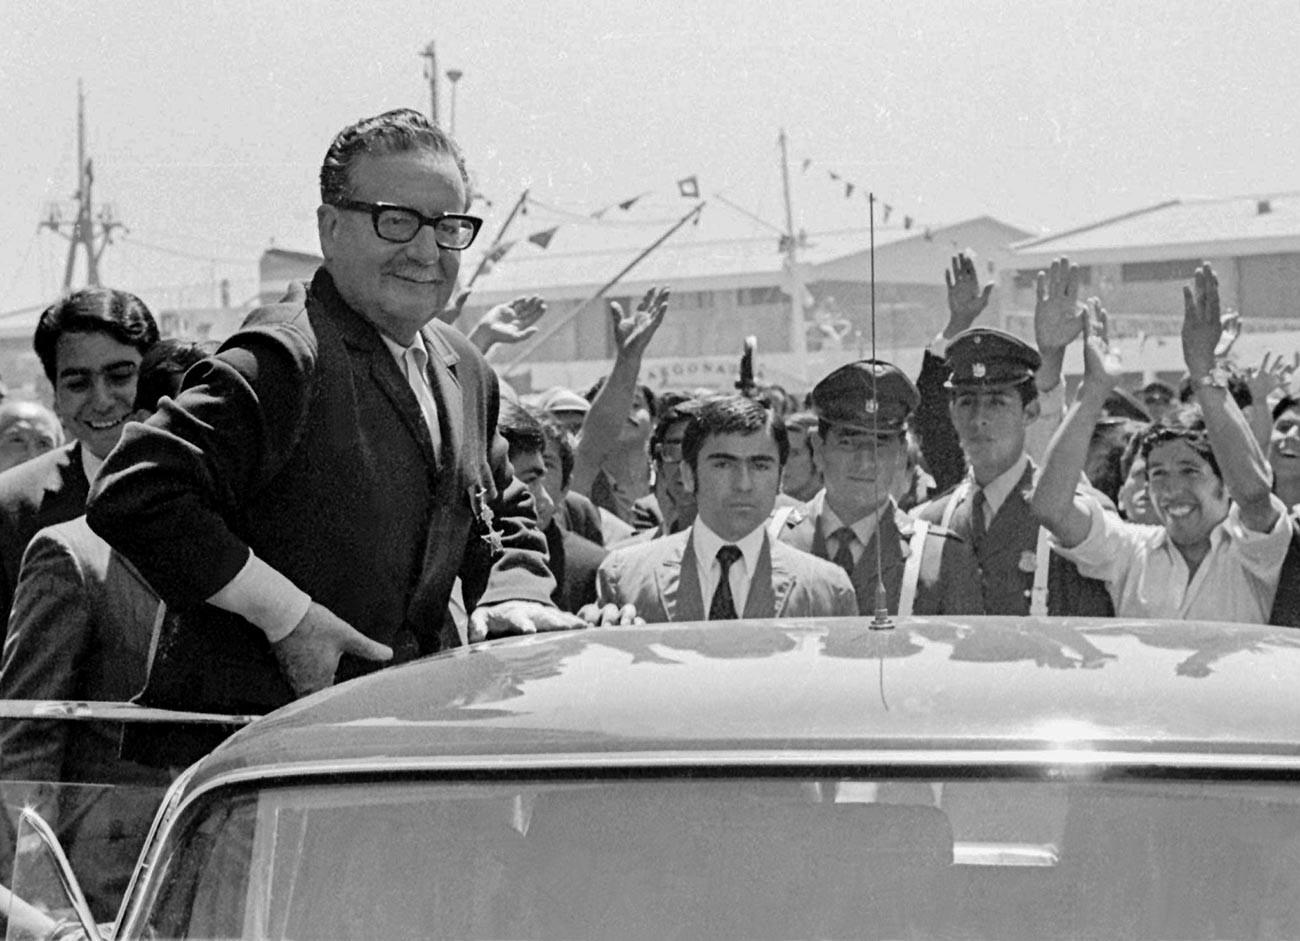 Predsjednik Salvador Allende